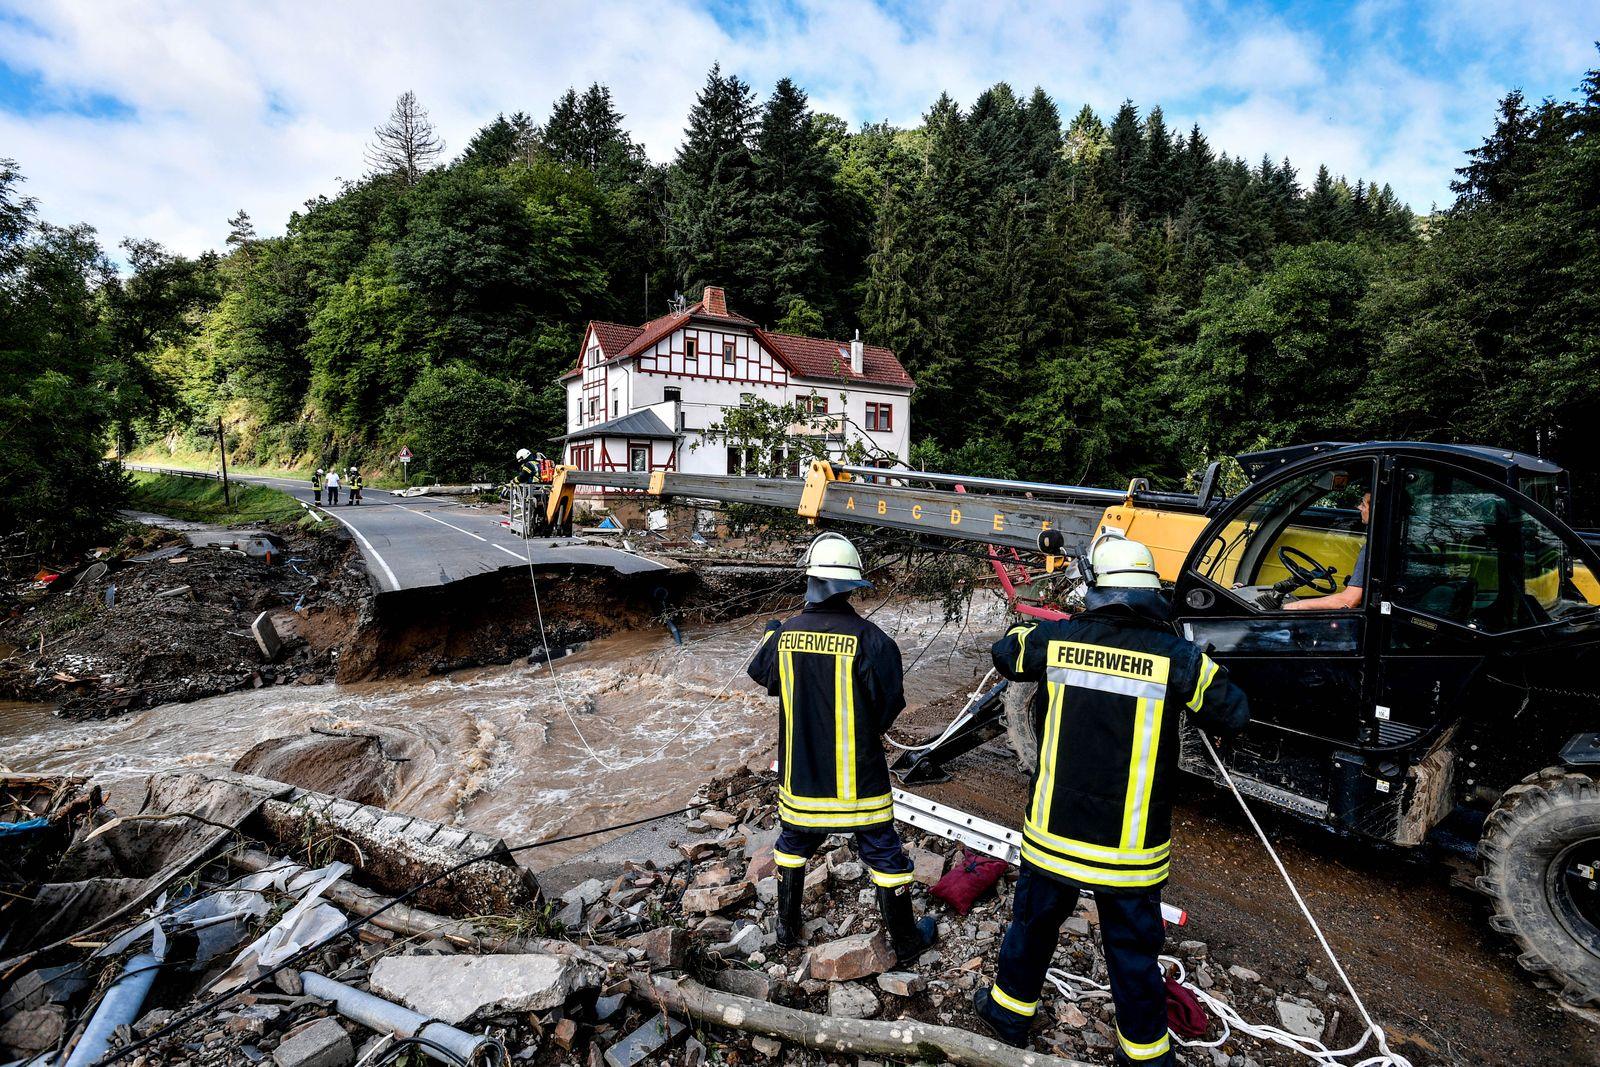 Thunderstorms with heavy rain hit Germany